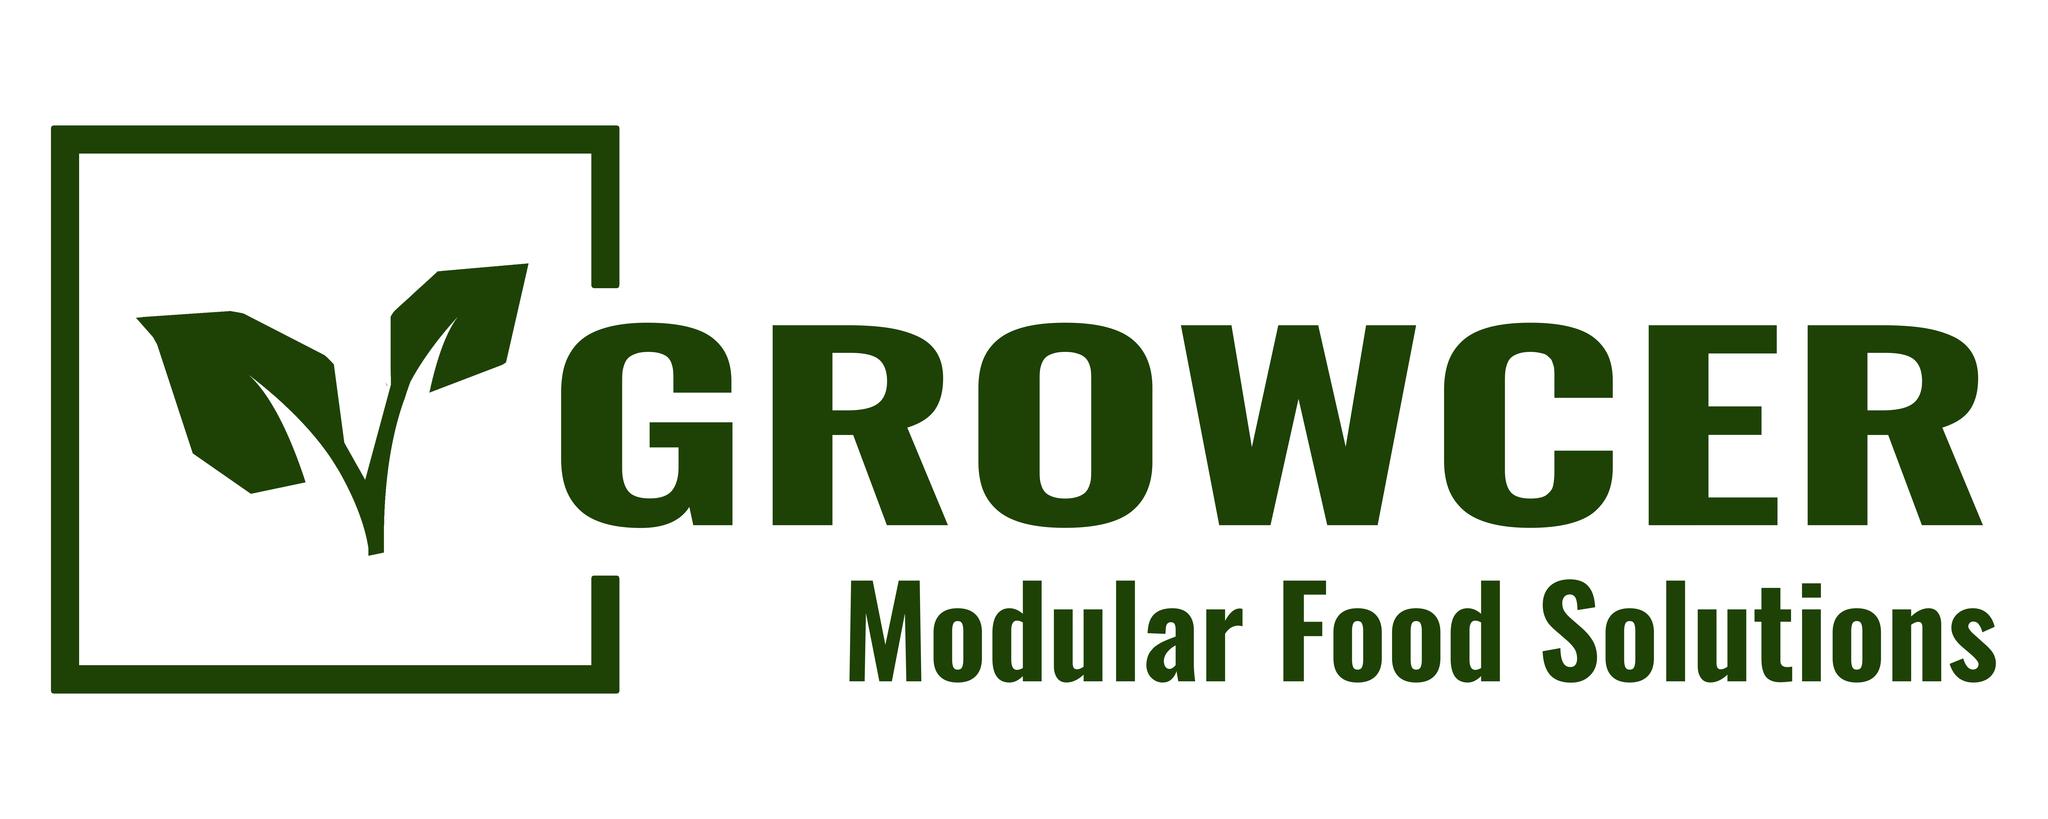 The Growcer Logo